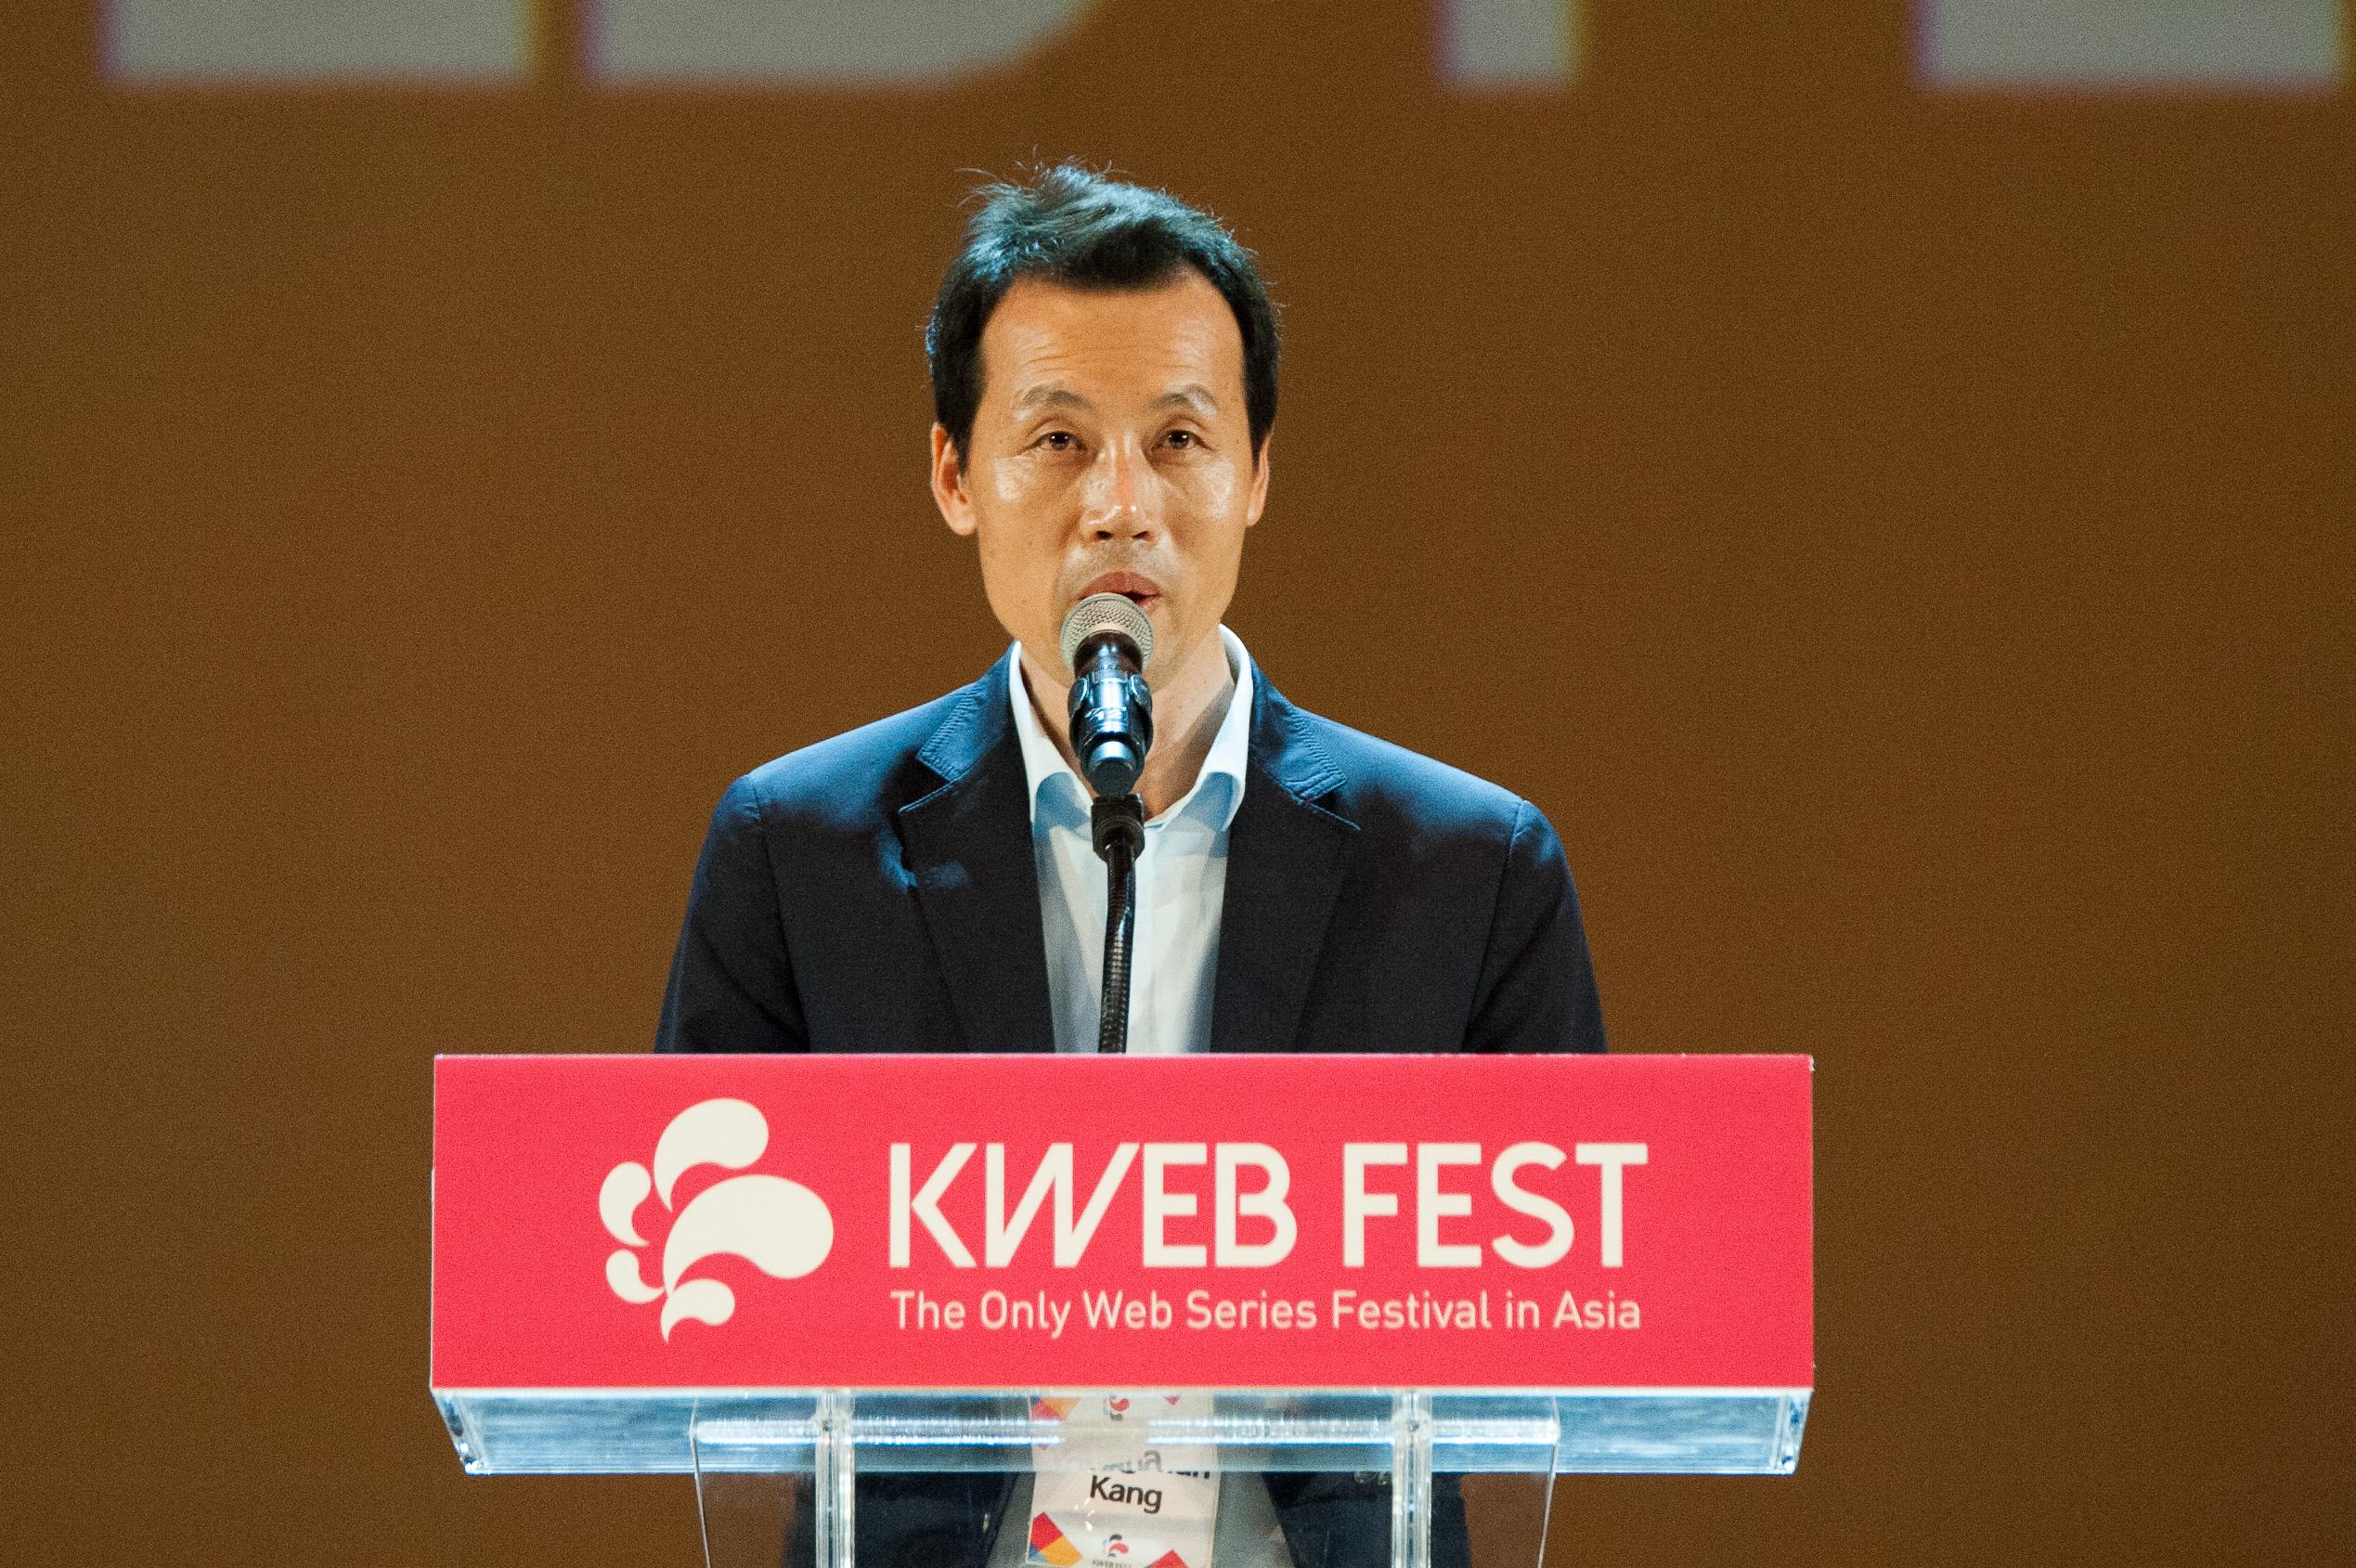 Young Man Kang, KWEB FEST 2016